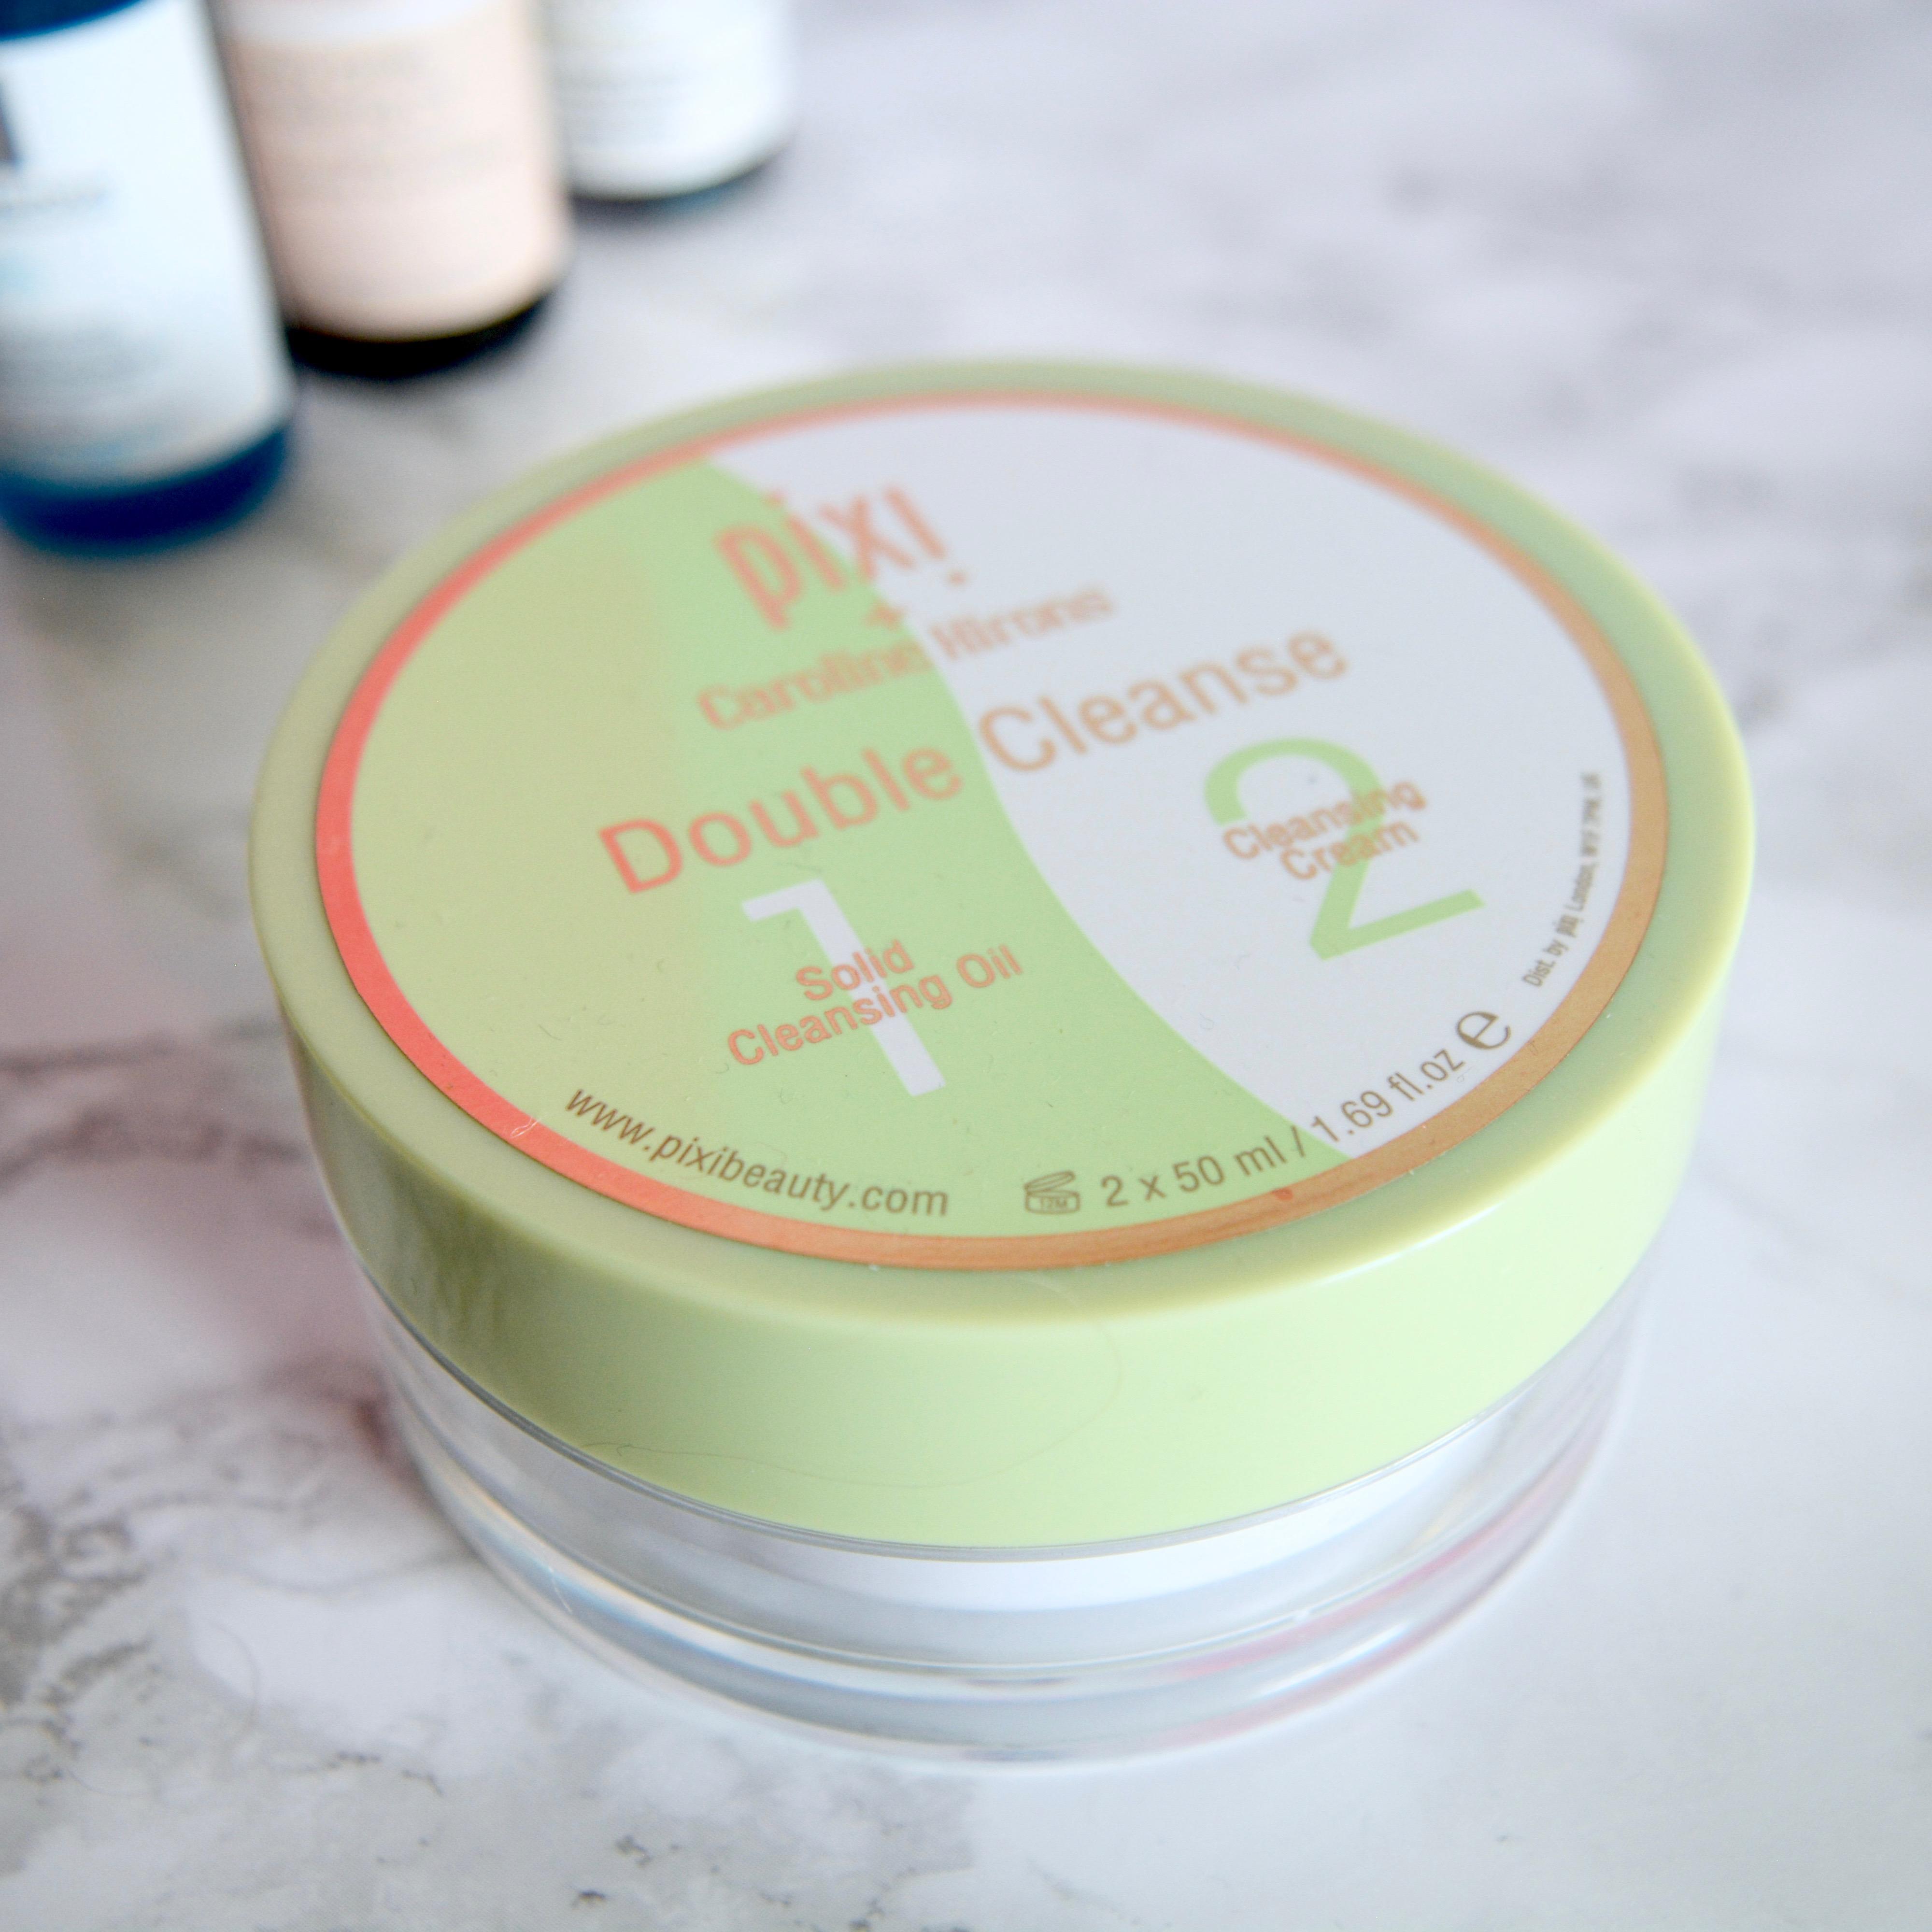 Pixi x Caroline Hirons Double Cleanse (Skincare Shake Up - full skincare routine for rosacea, sensitive skin)